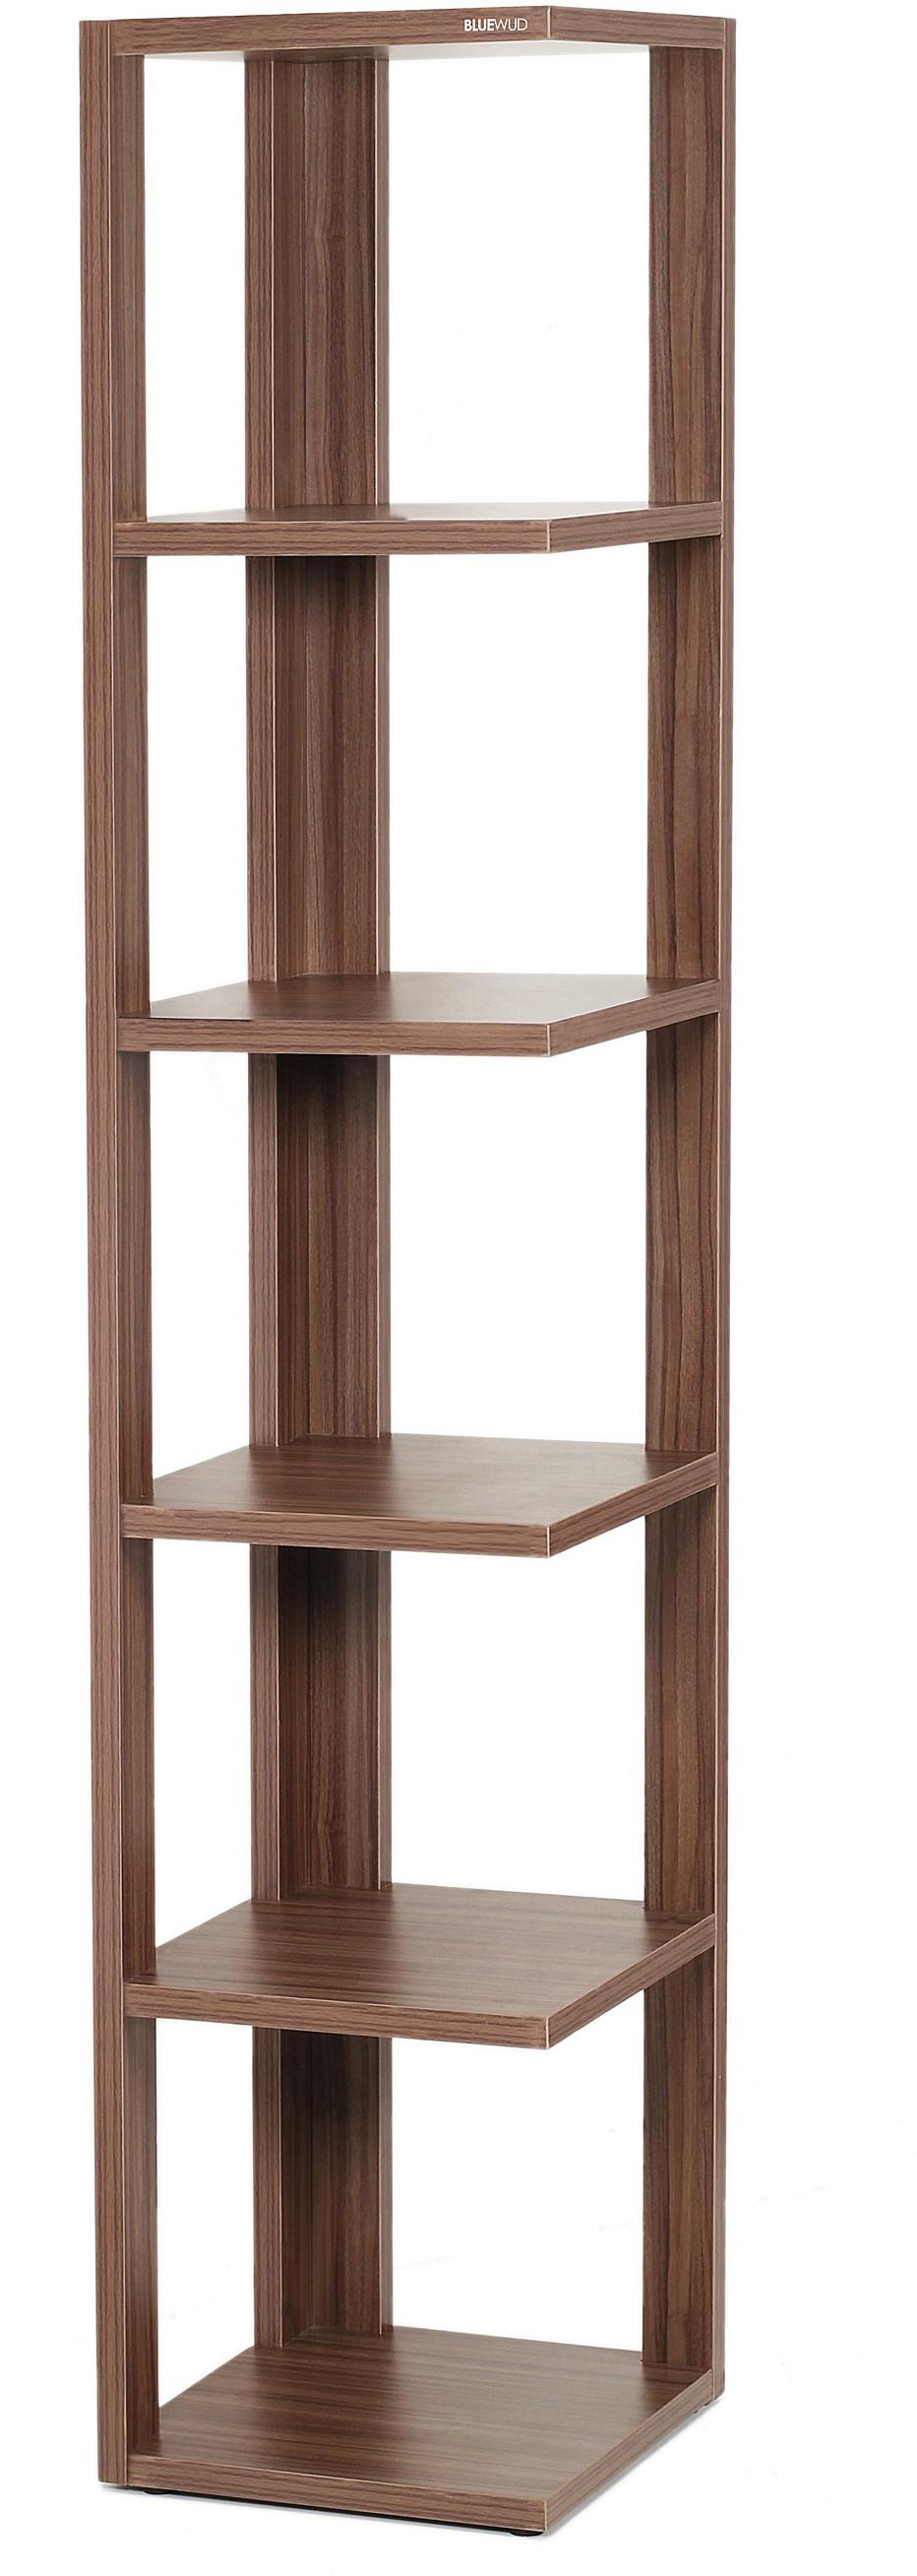 View Bluewud Albert Engineered Wood Open Book Shelf(Finish Color - Walnut) Furniture (Bluewud)